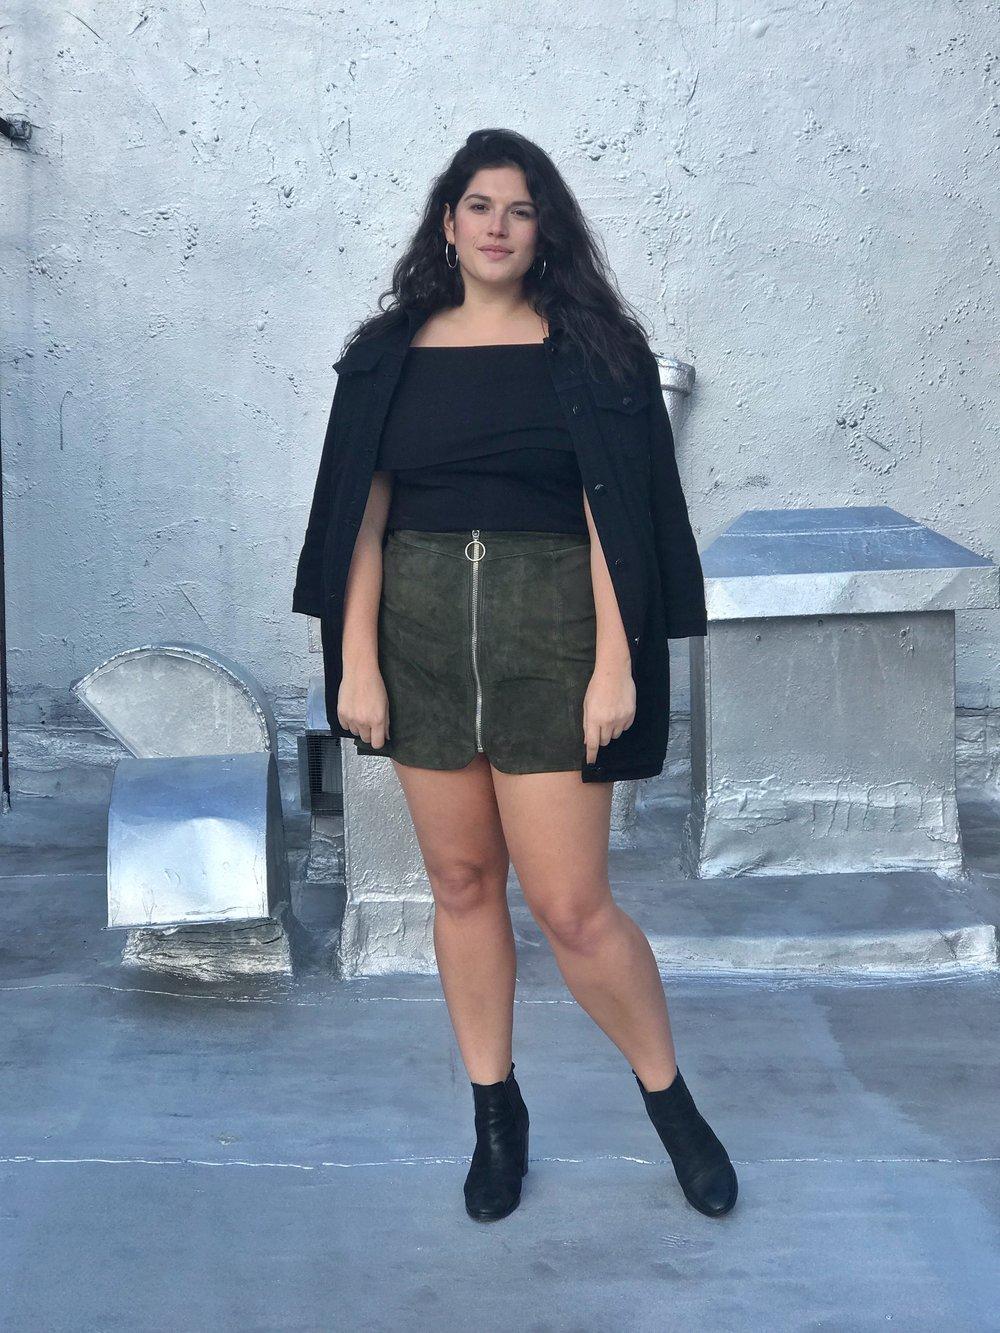 plus-size-curvy-girl-stylist